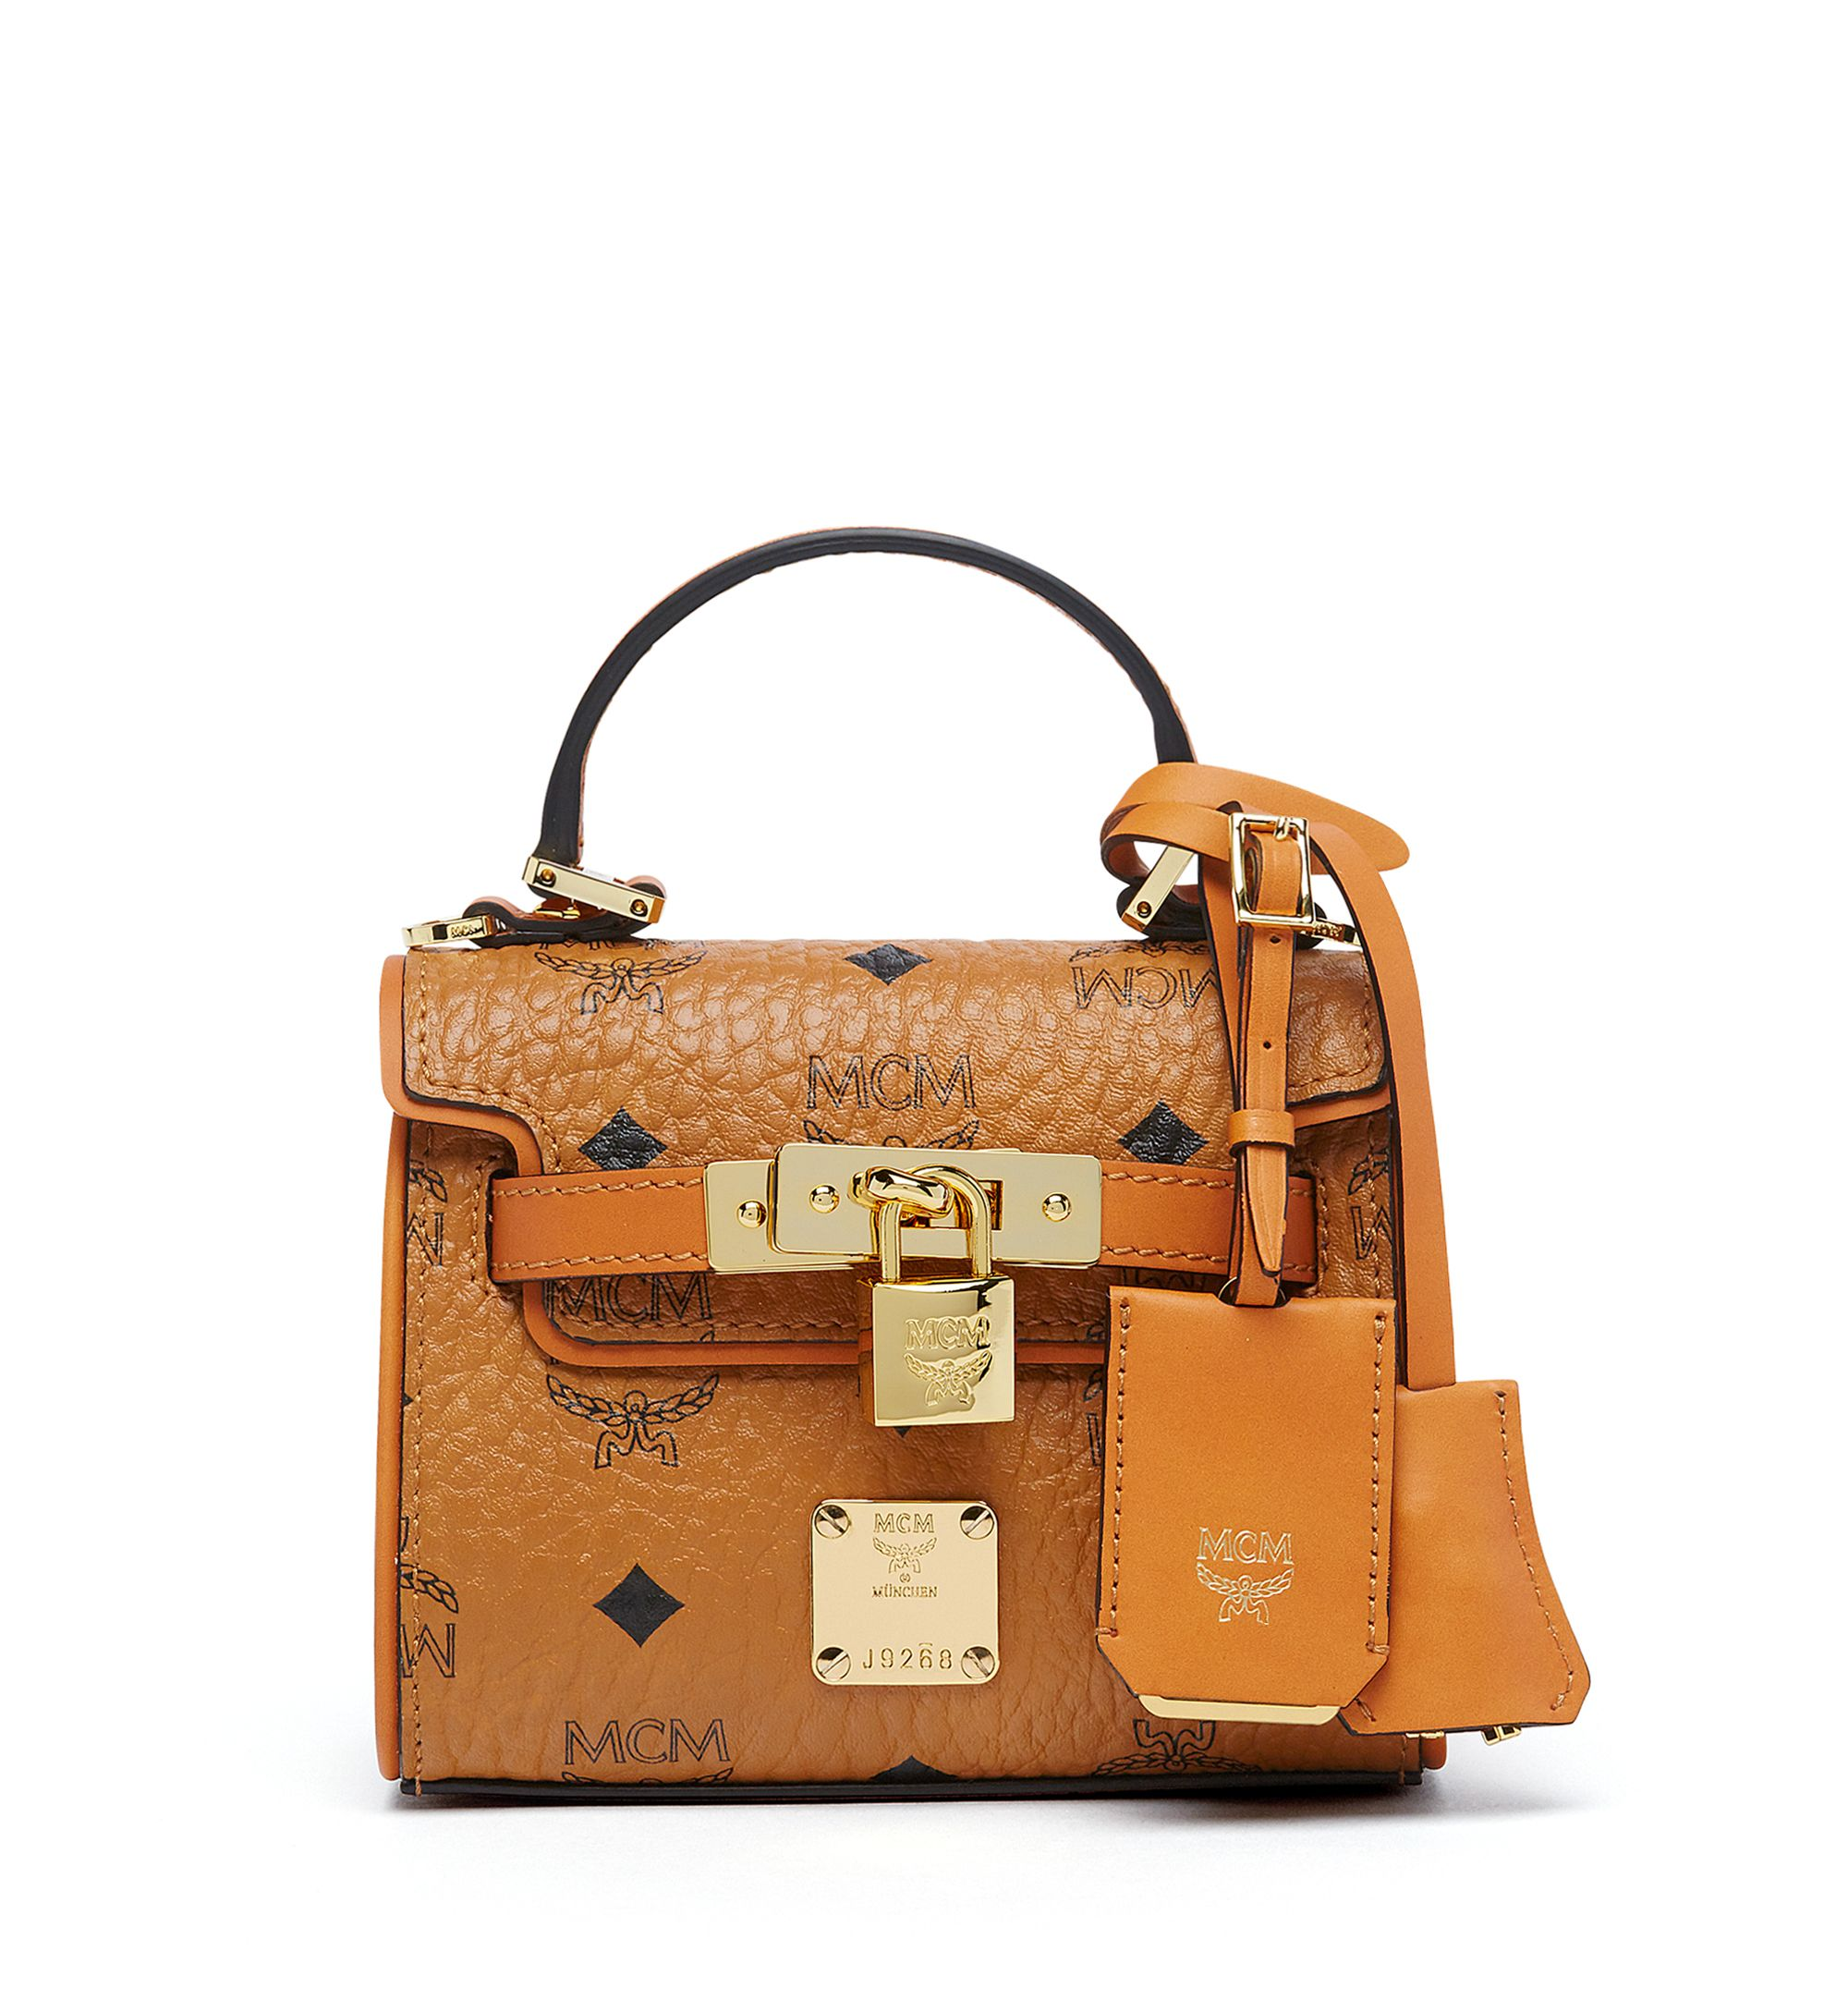 32d8de471ca HERITAGE SATCHEL | Handbags | Bags, Mcm backpack, Hand luggage